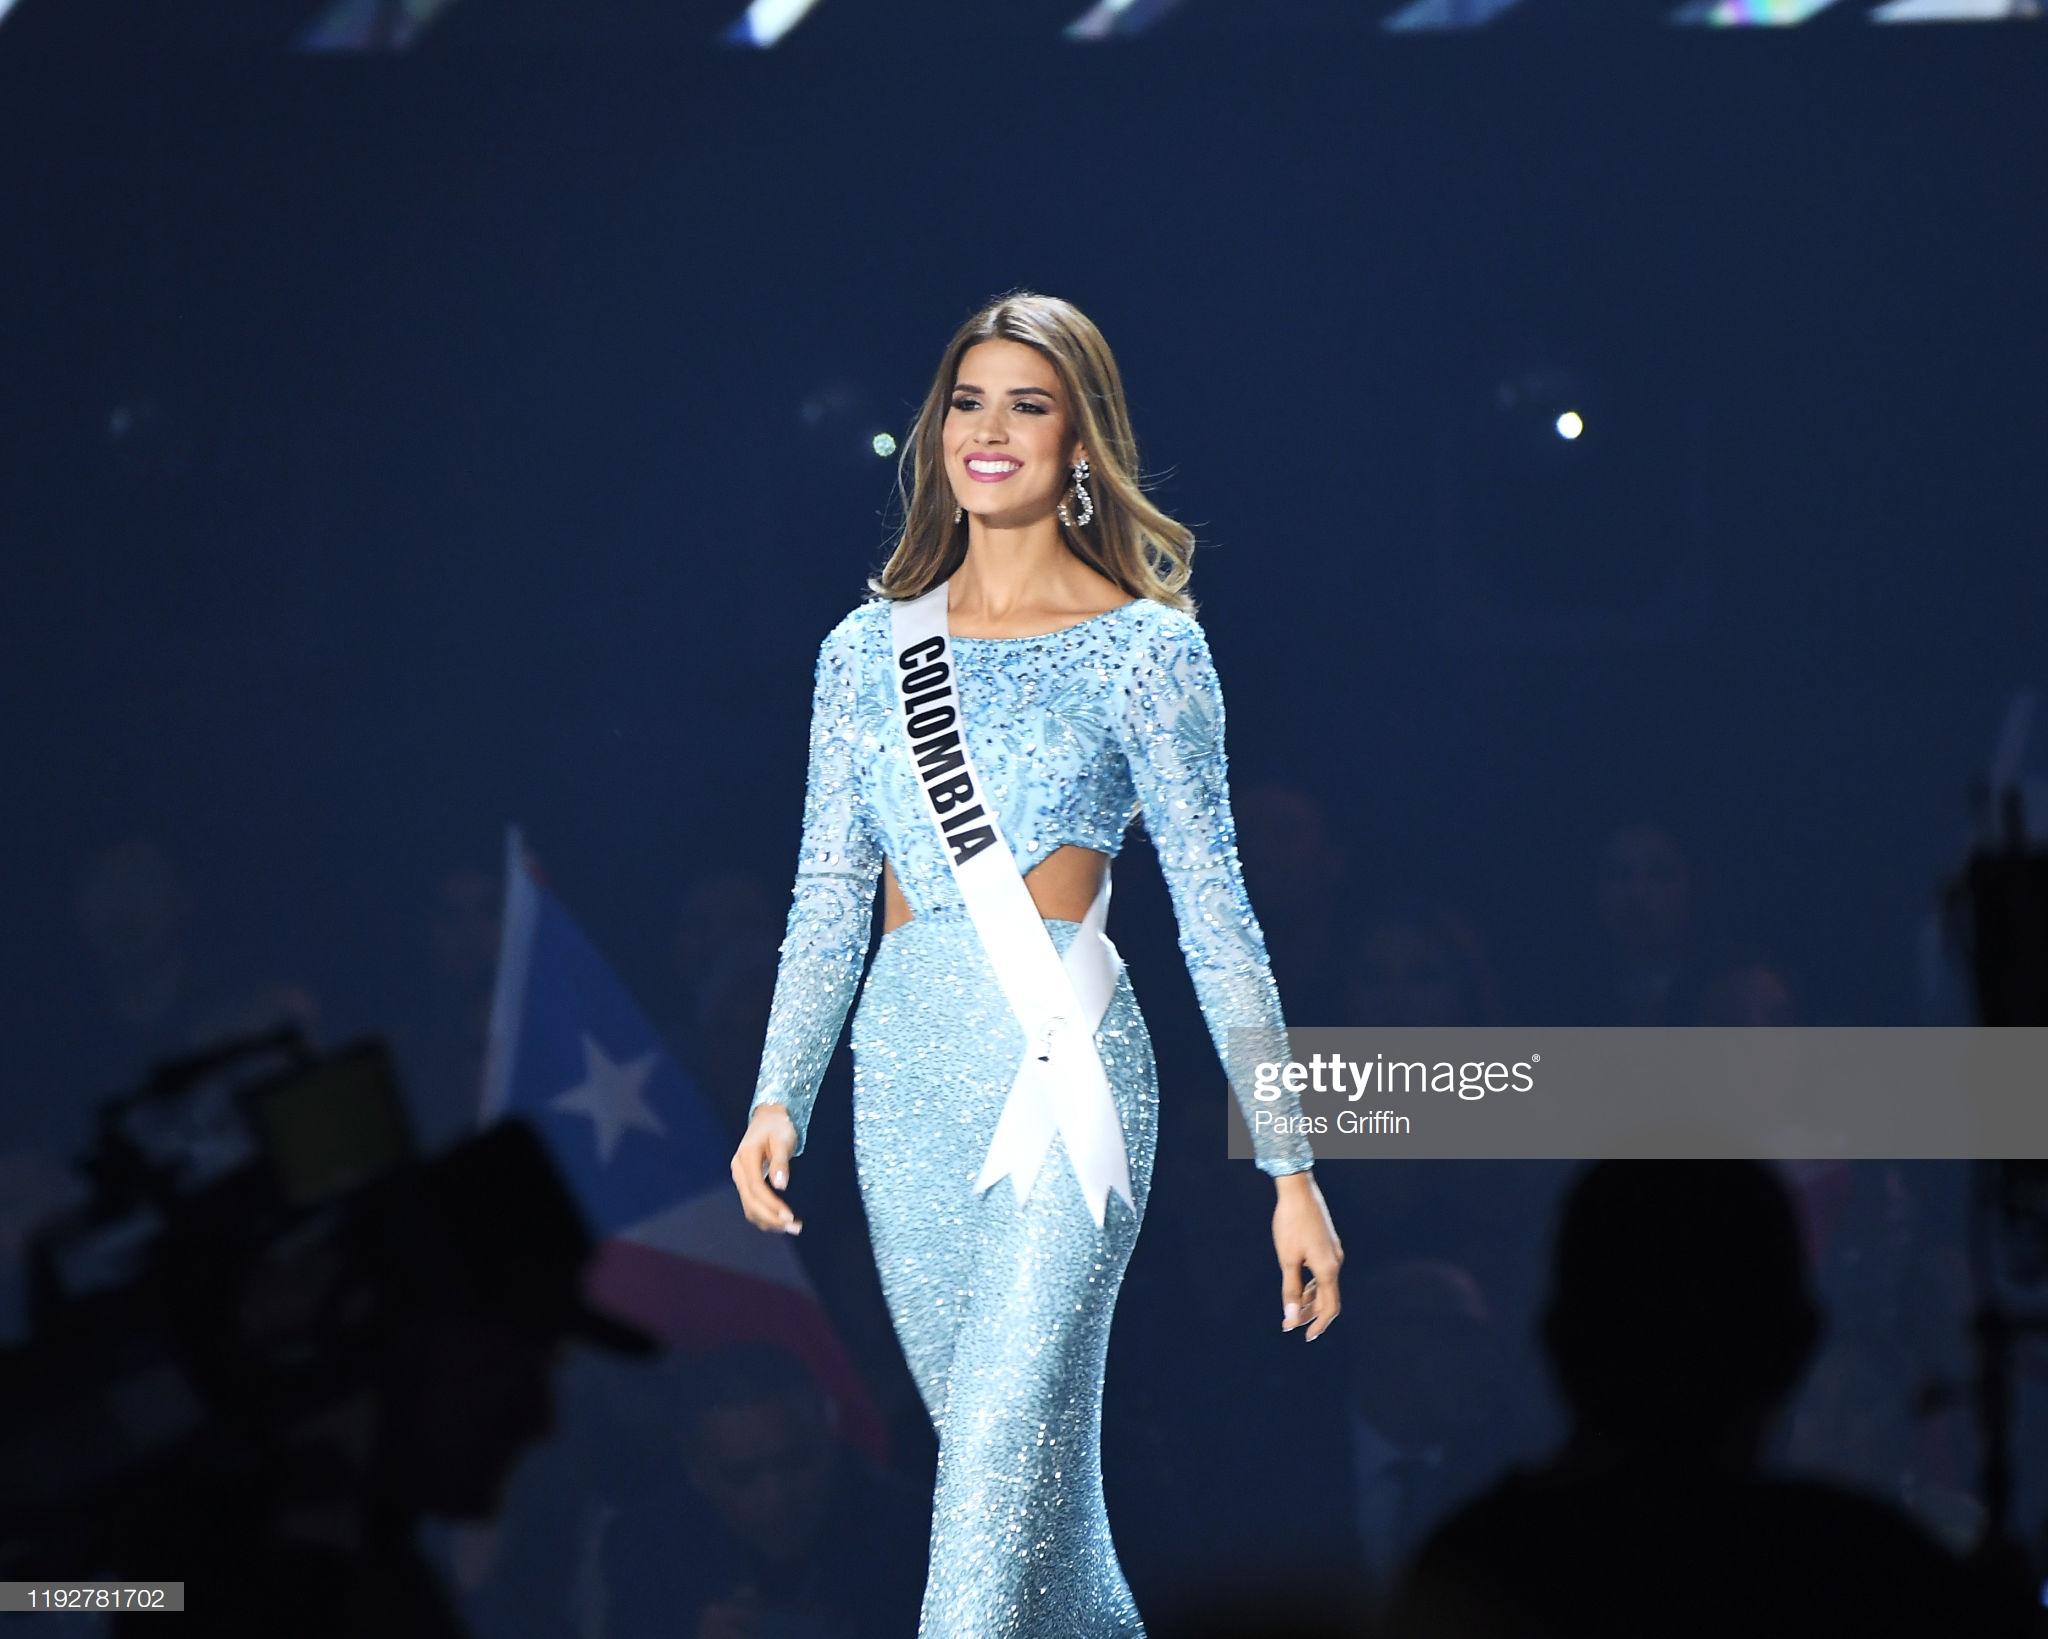 gabriela tafur, top 5 de miss universe 2019. - Página 27 Miss-c13